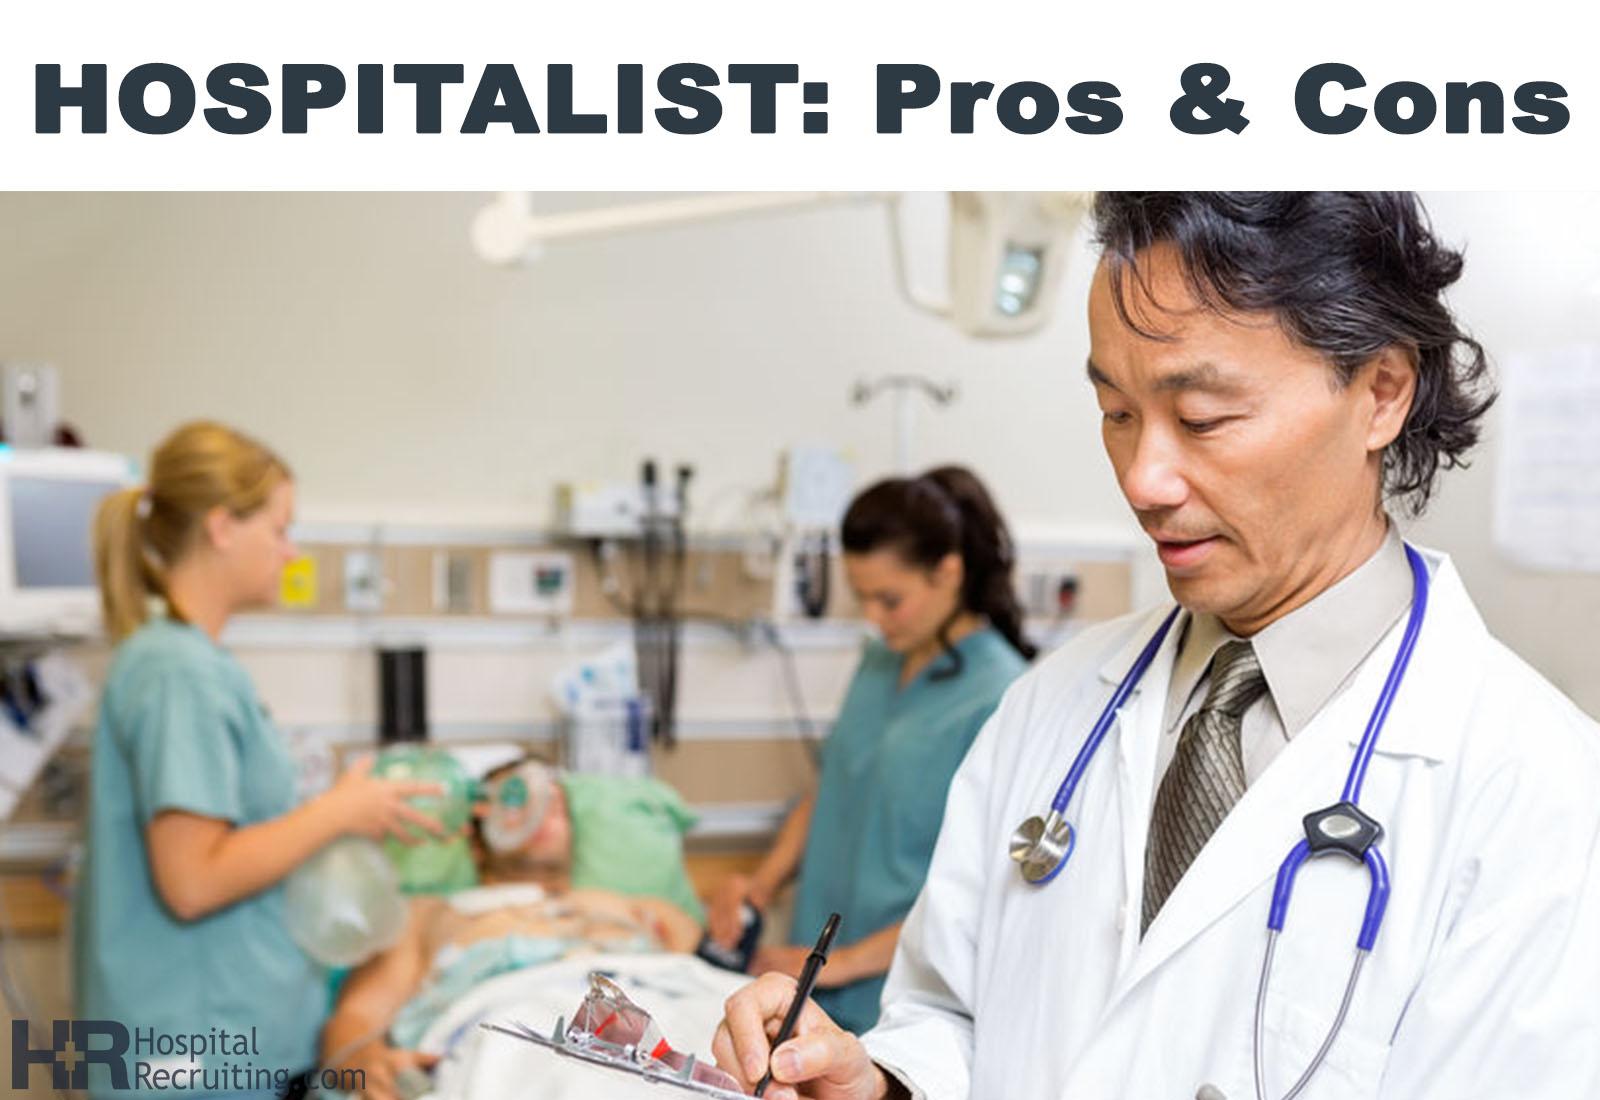 The Hospitalist Model